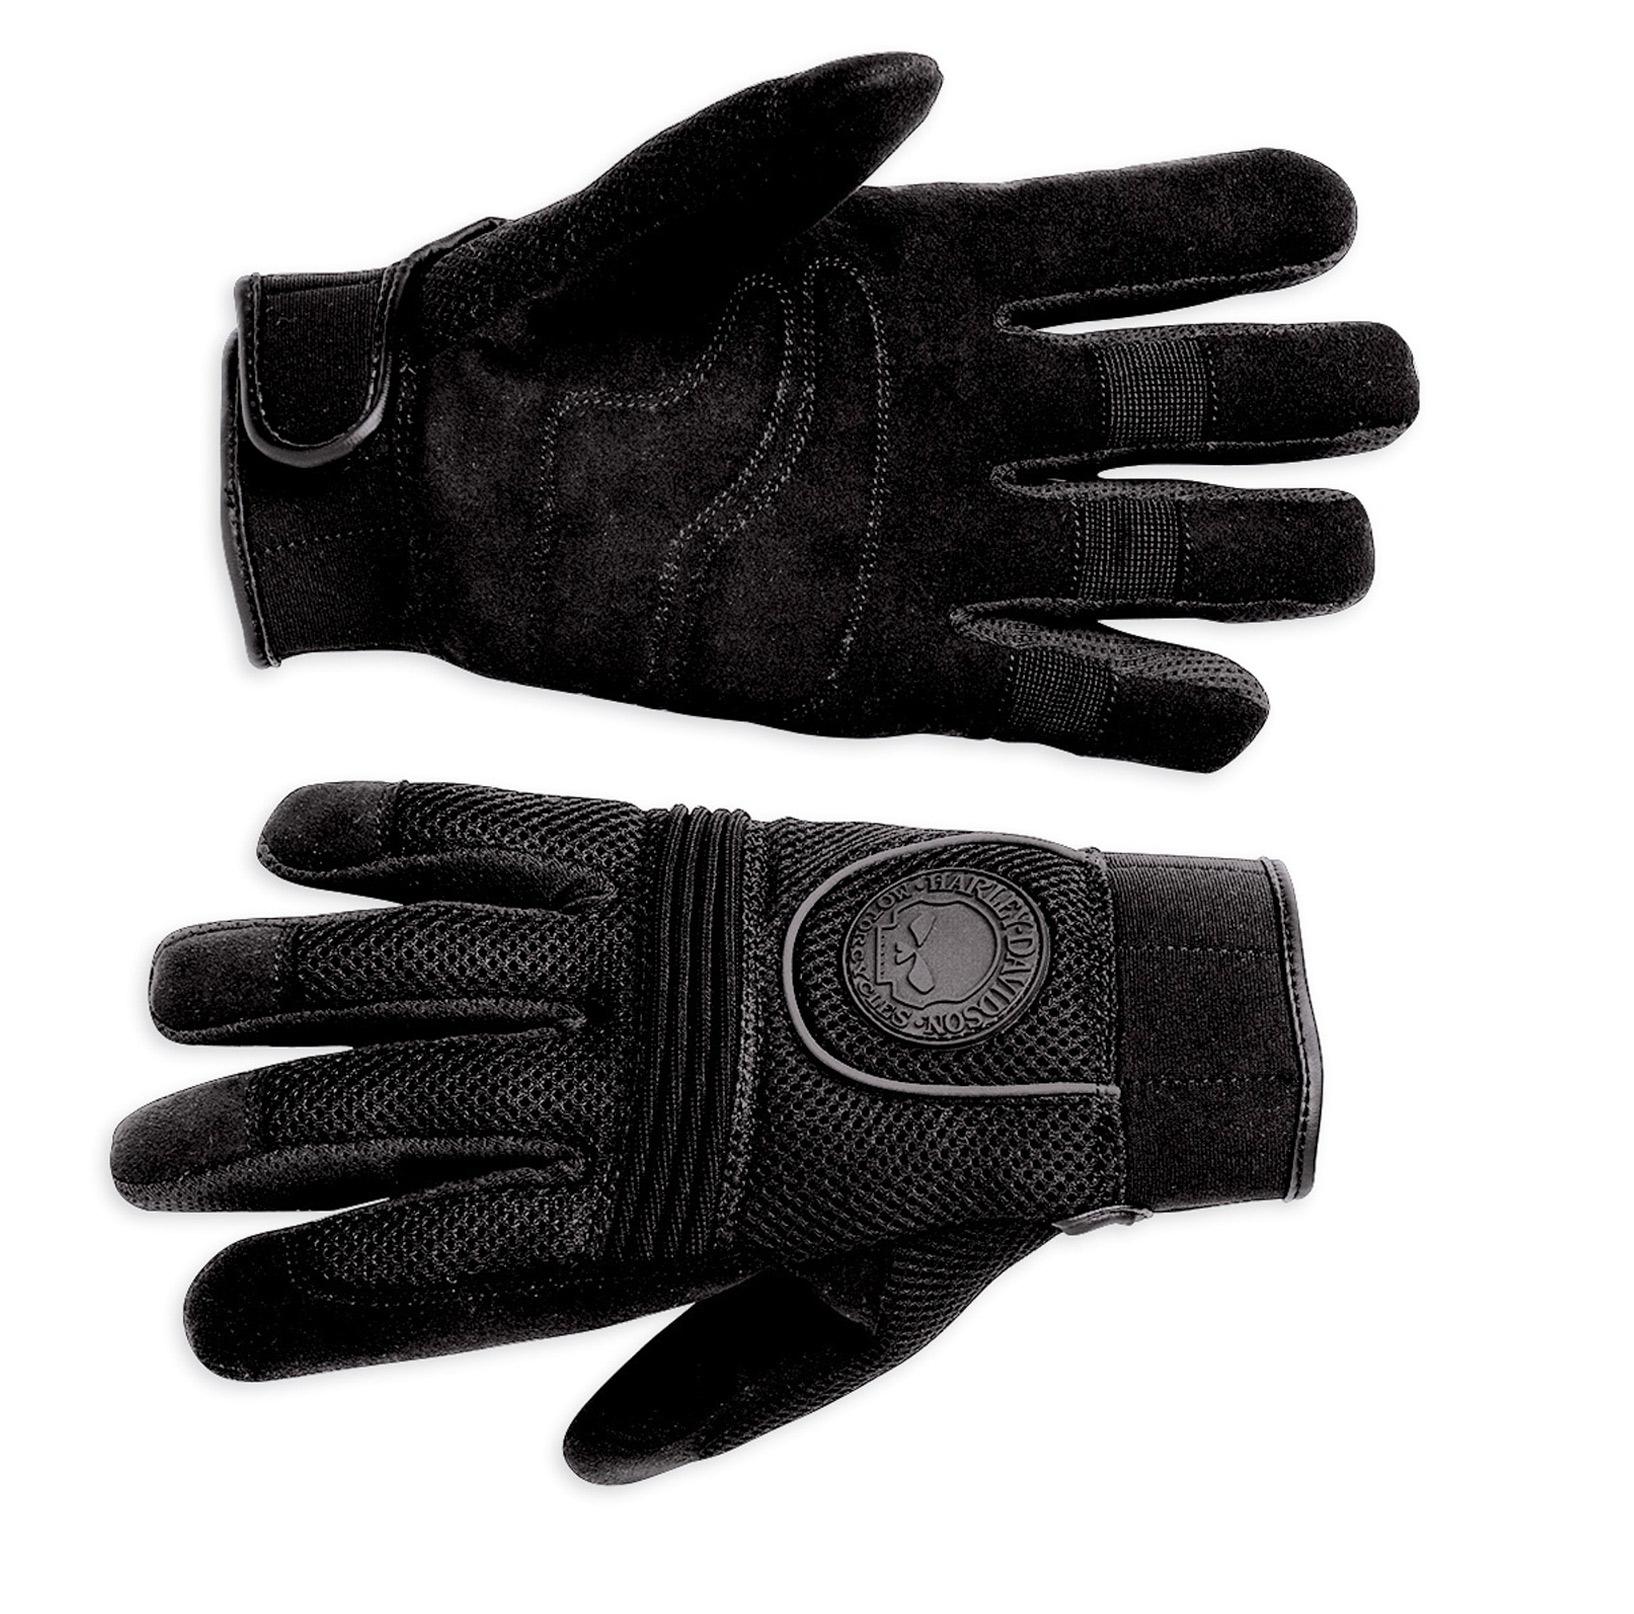 98254 10vm 000l skull full finger mesh gloves l im. Black Bedroom Furniture Sets. Home Design Ideas